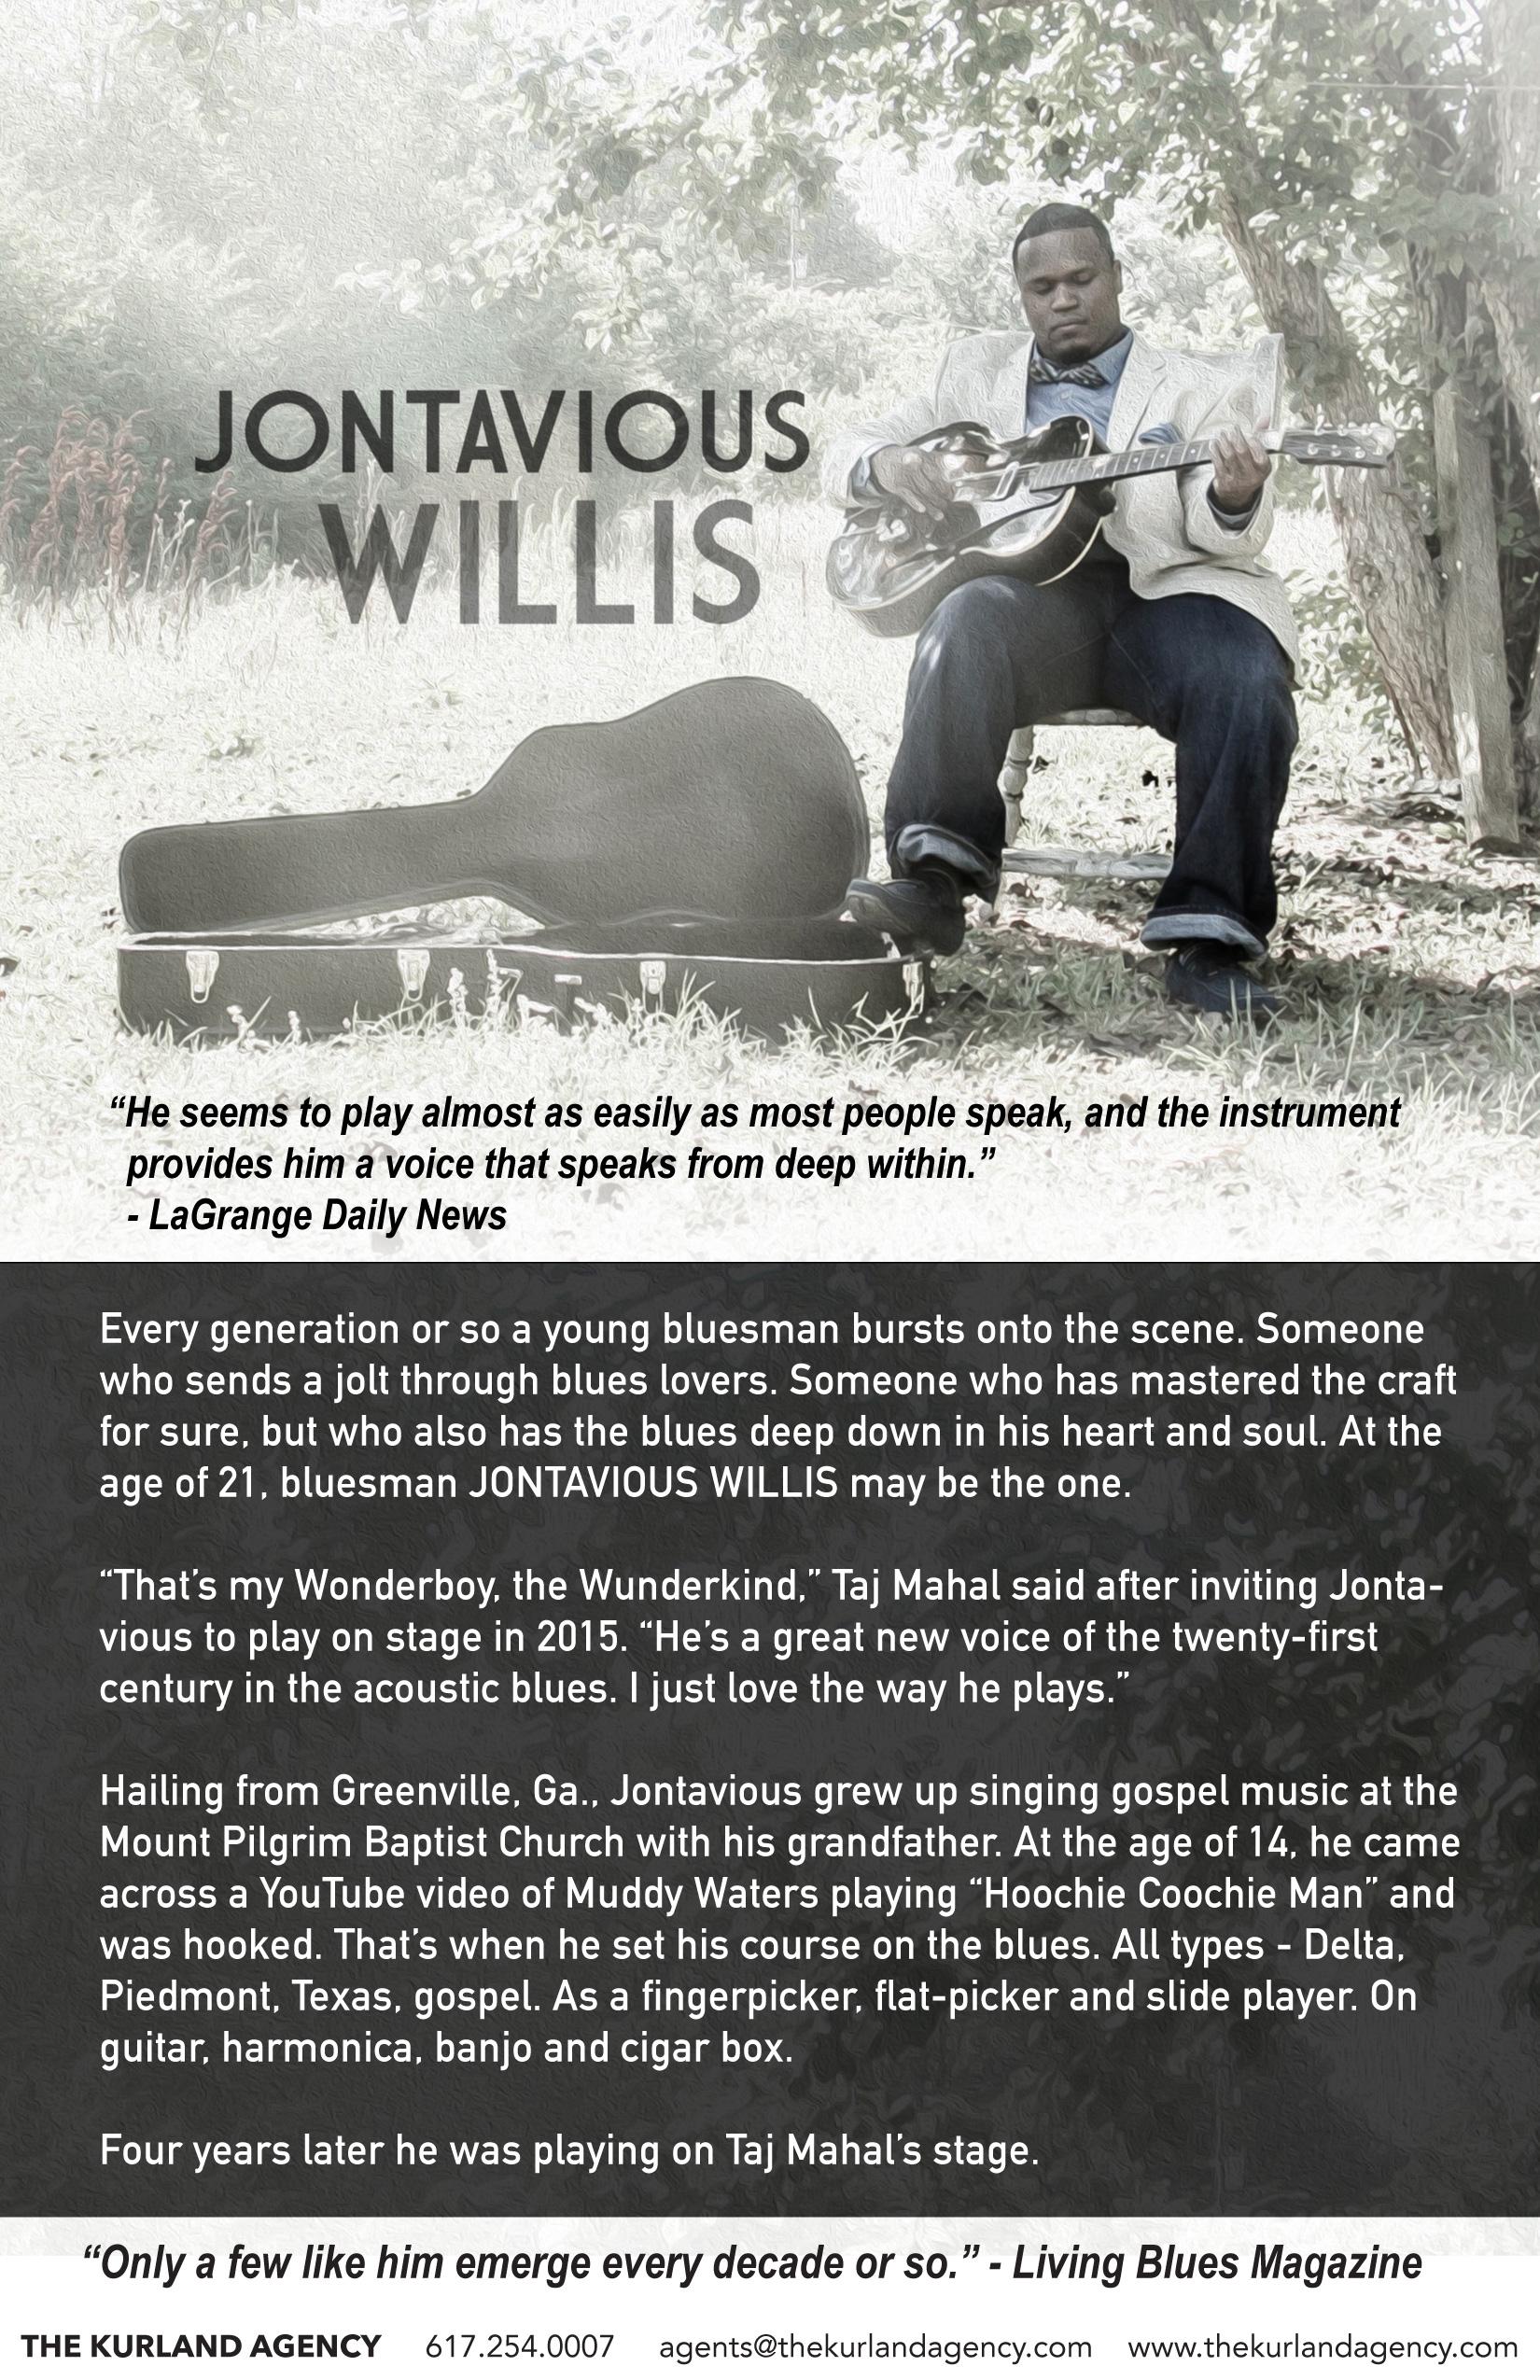 JontaviousWillis2018 - The Kurland Agency